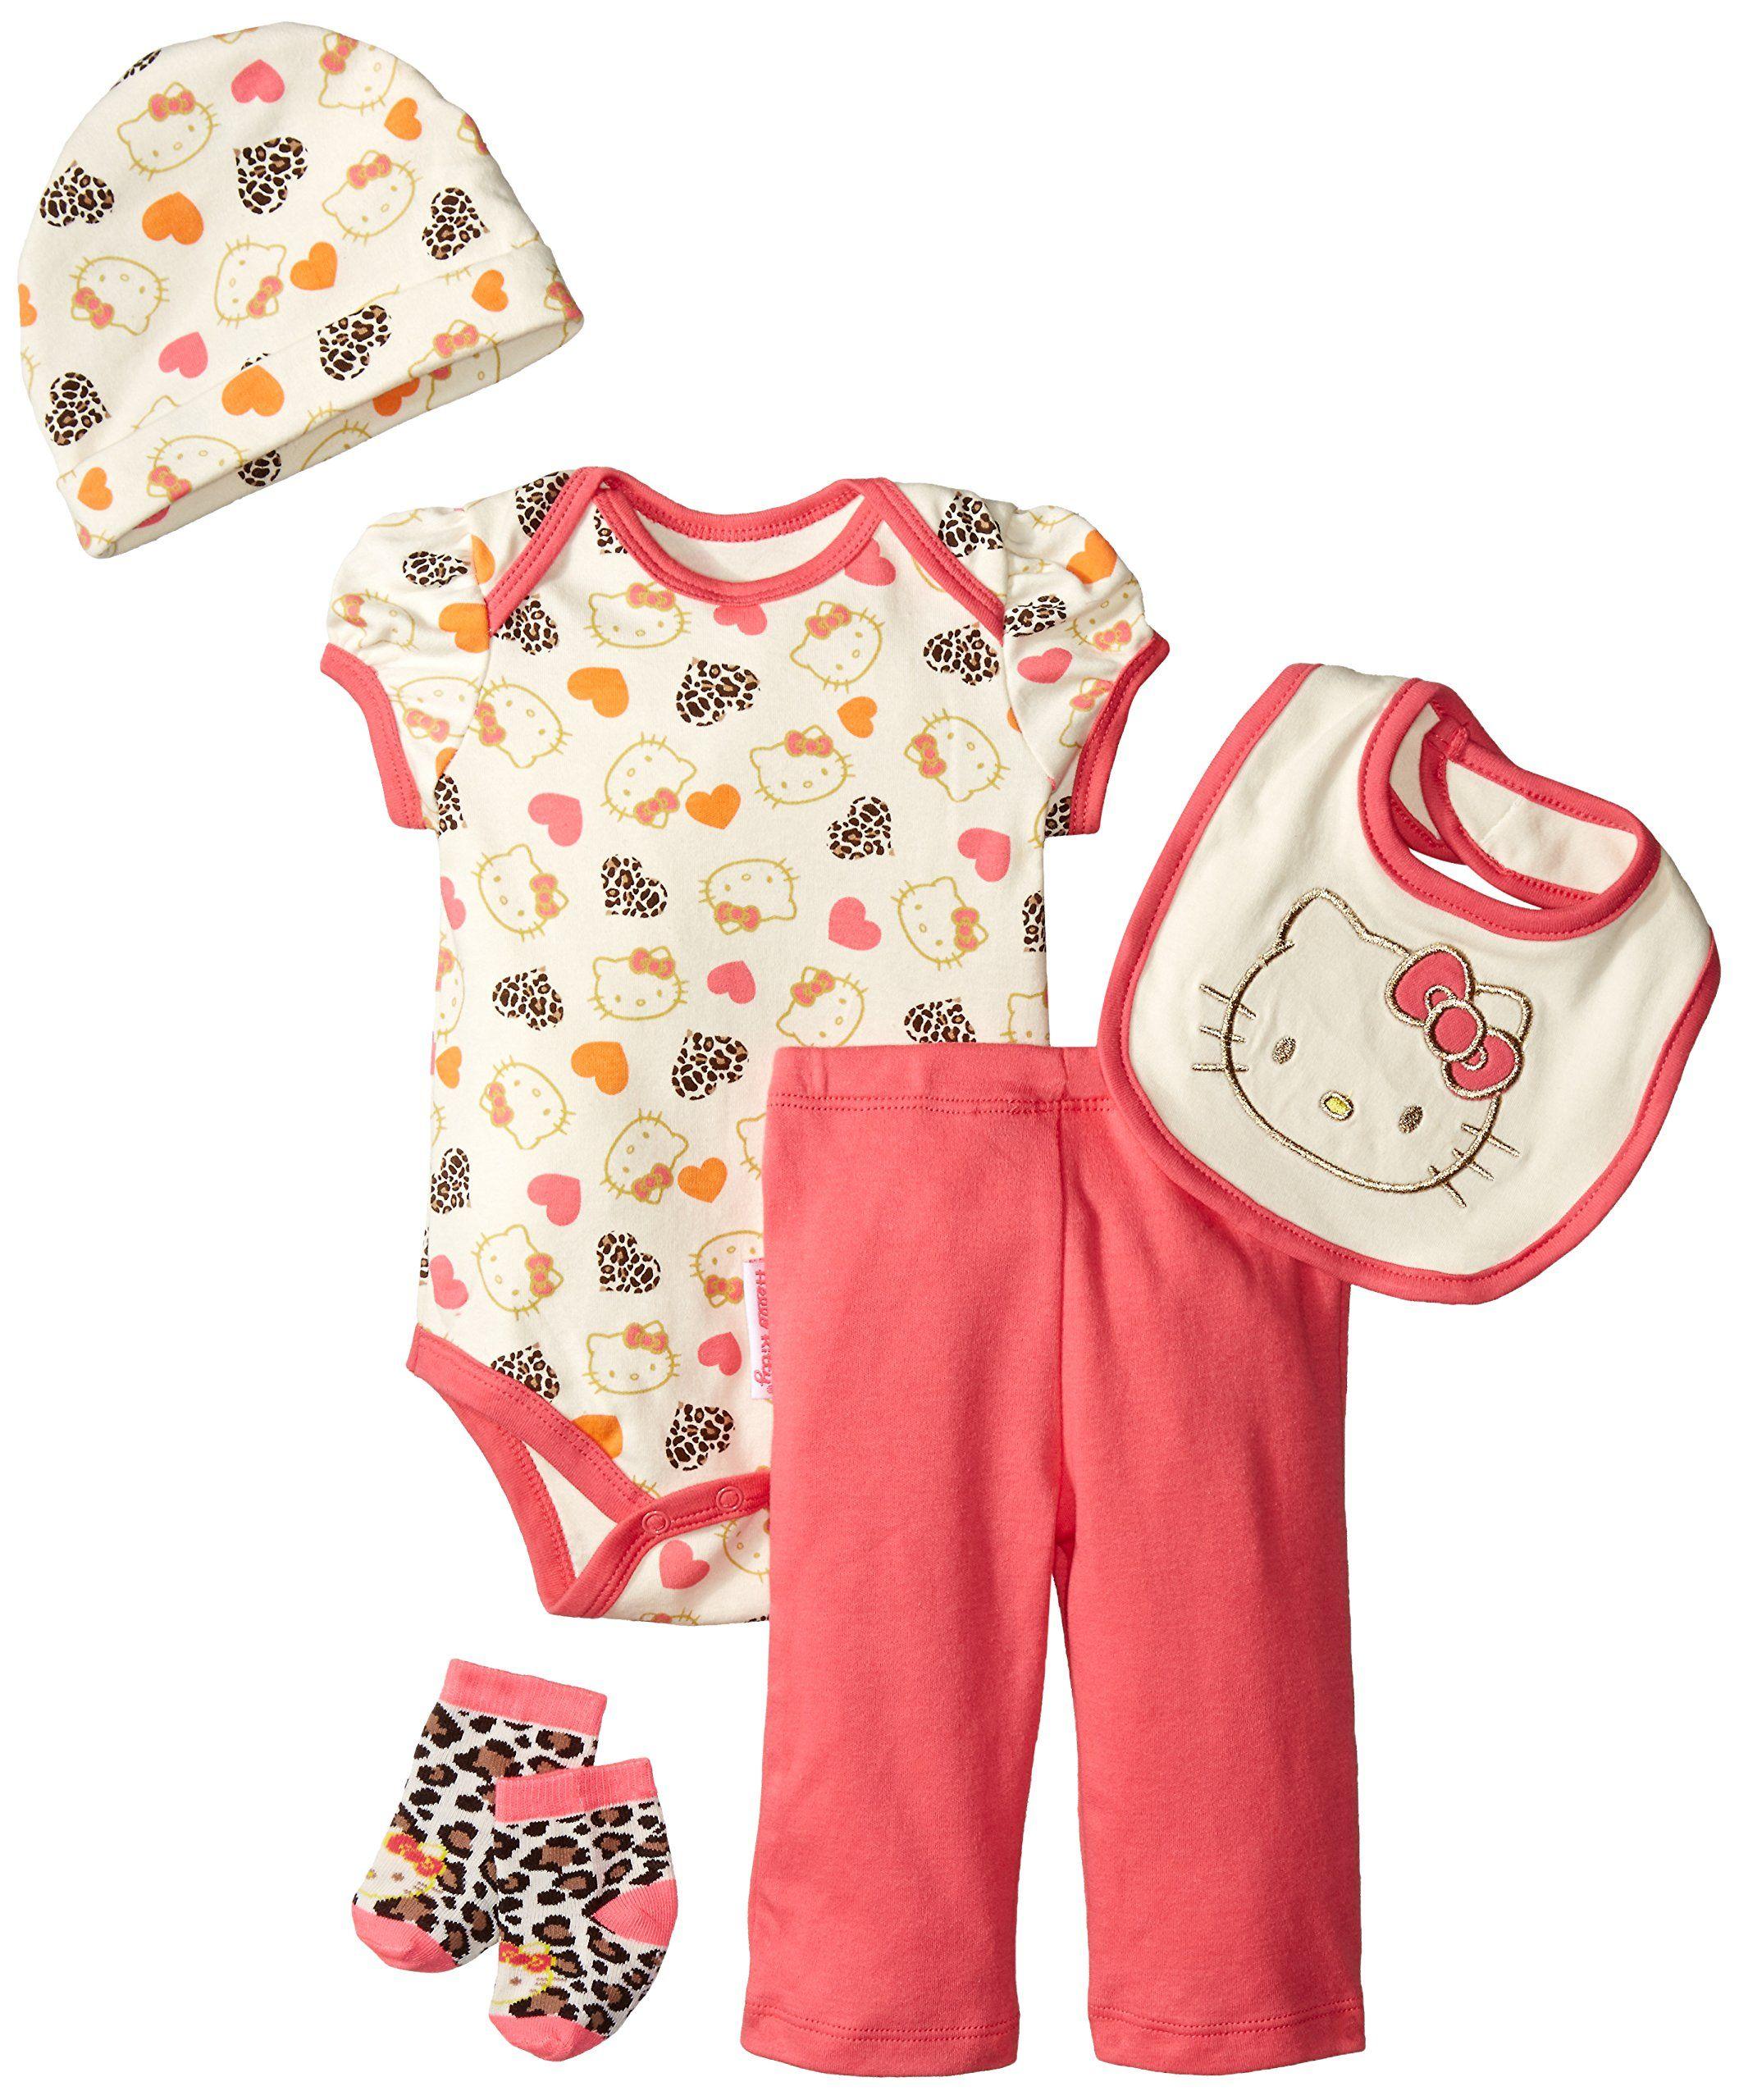 2c939794bdb49 Amazon.com: Hello Kitty Baby-Girls Newborn 5 Piece Hearts Set, Dark ...